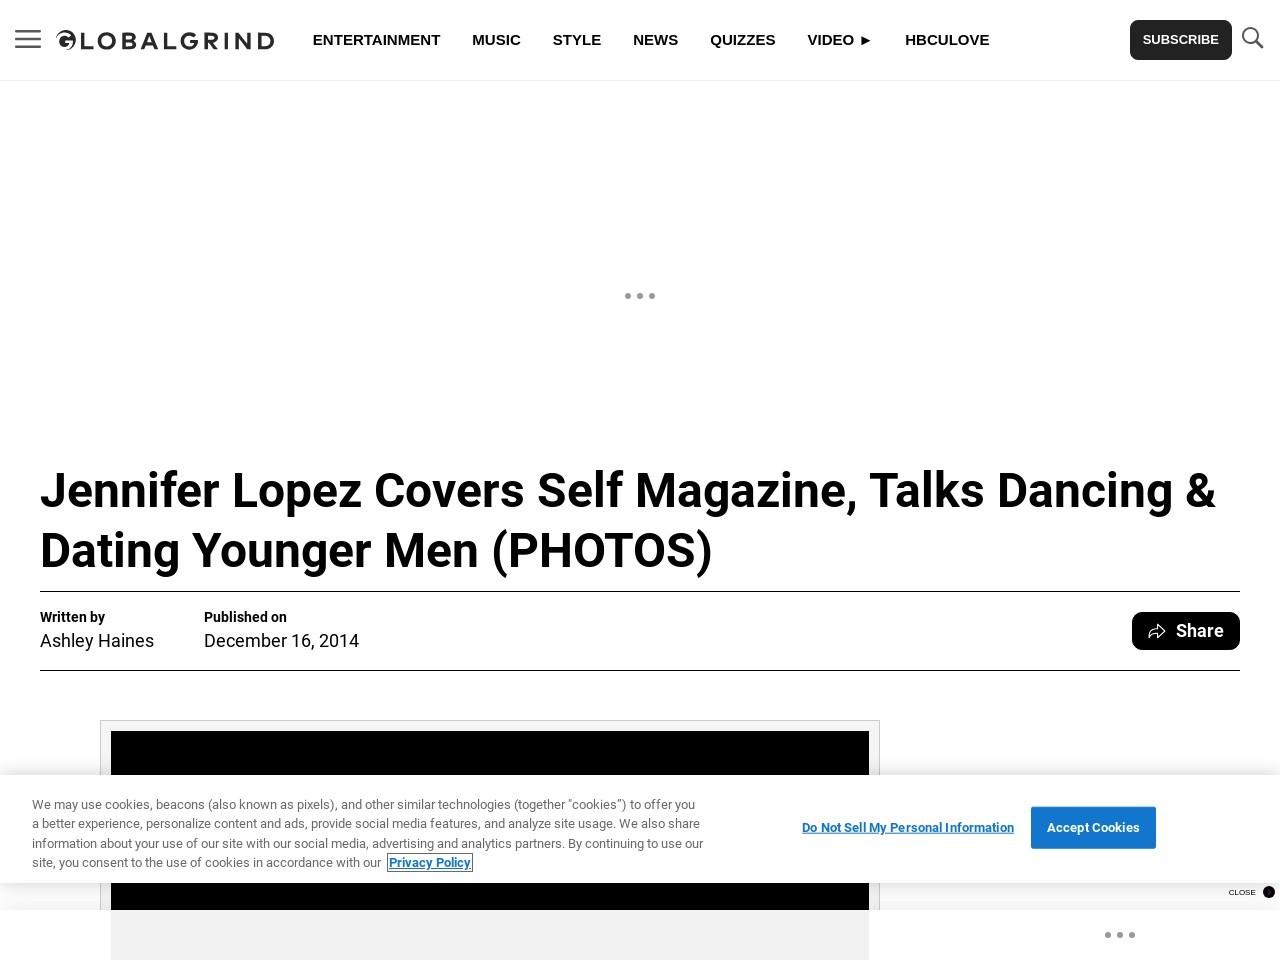 Jennifer Lopez Covers Self Magazine, Talks Dancing & Dating